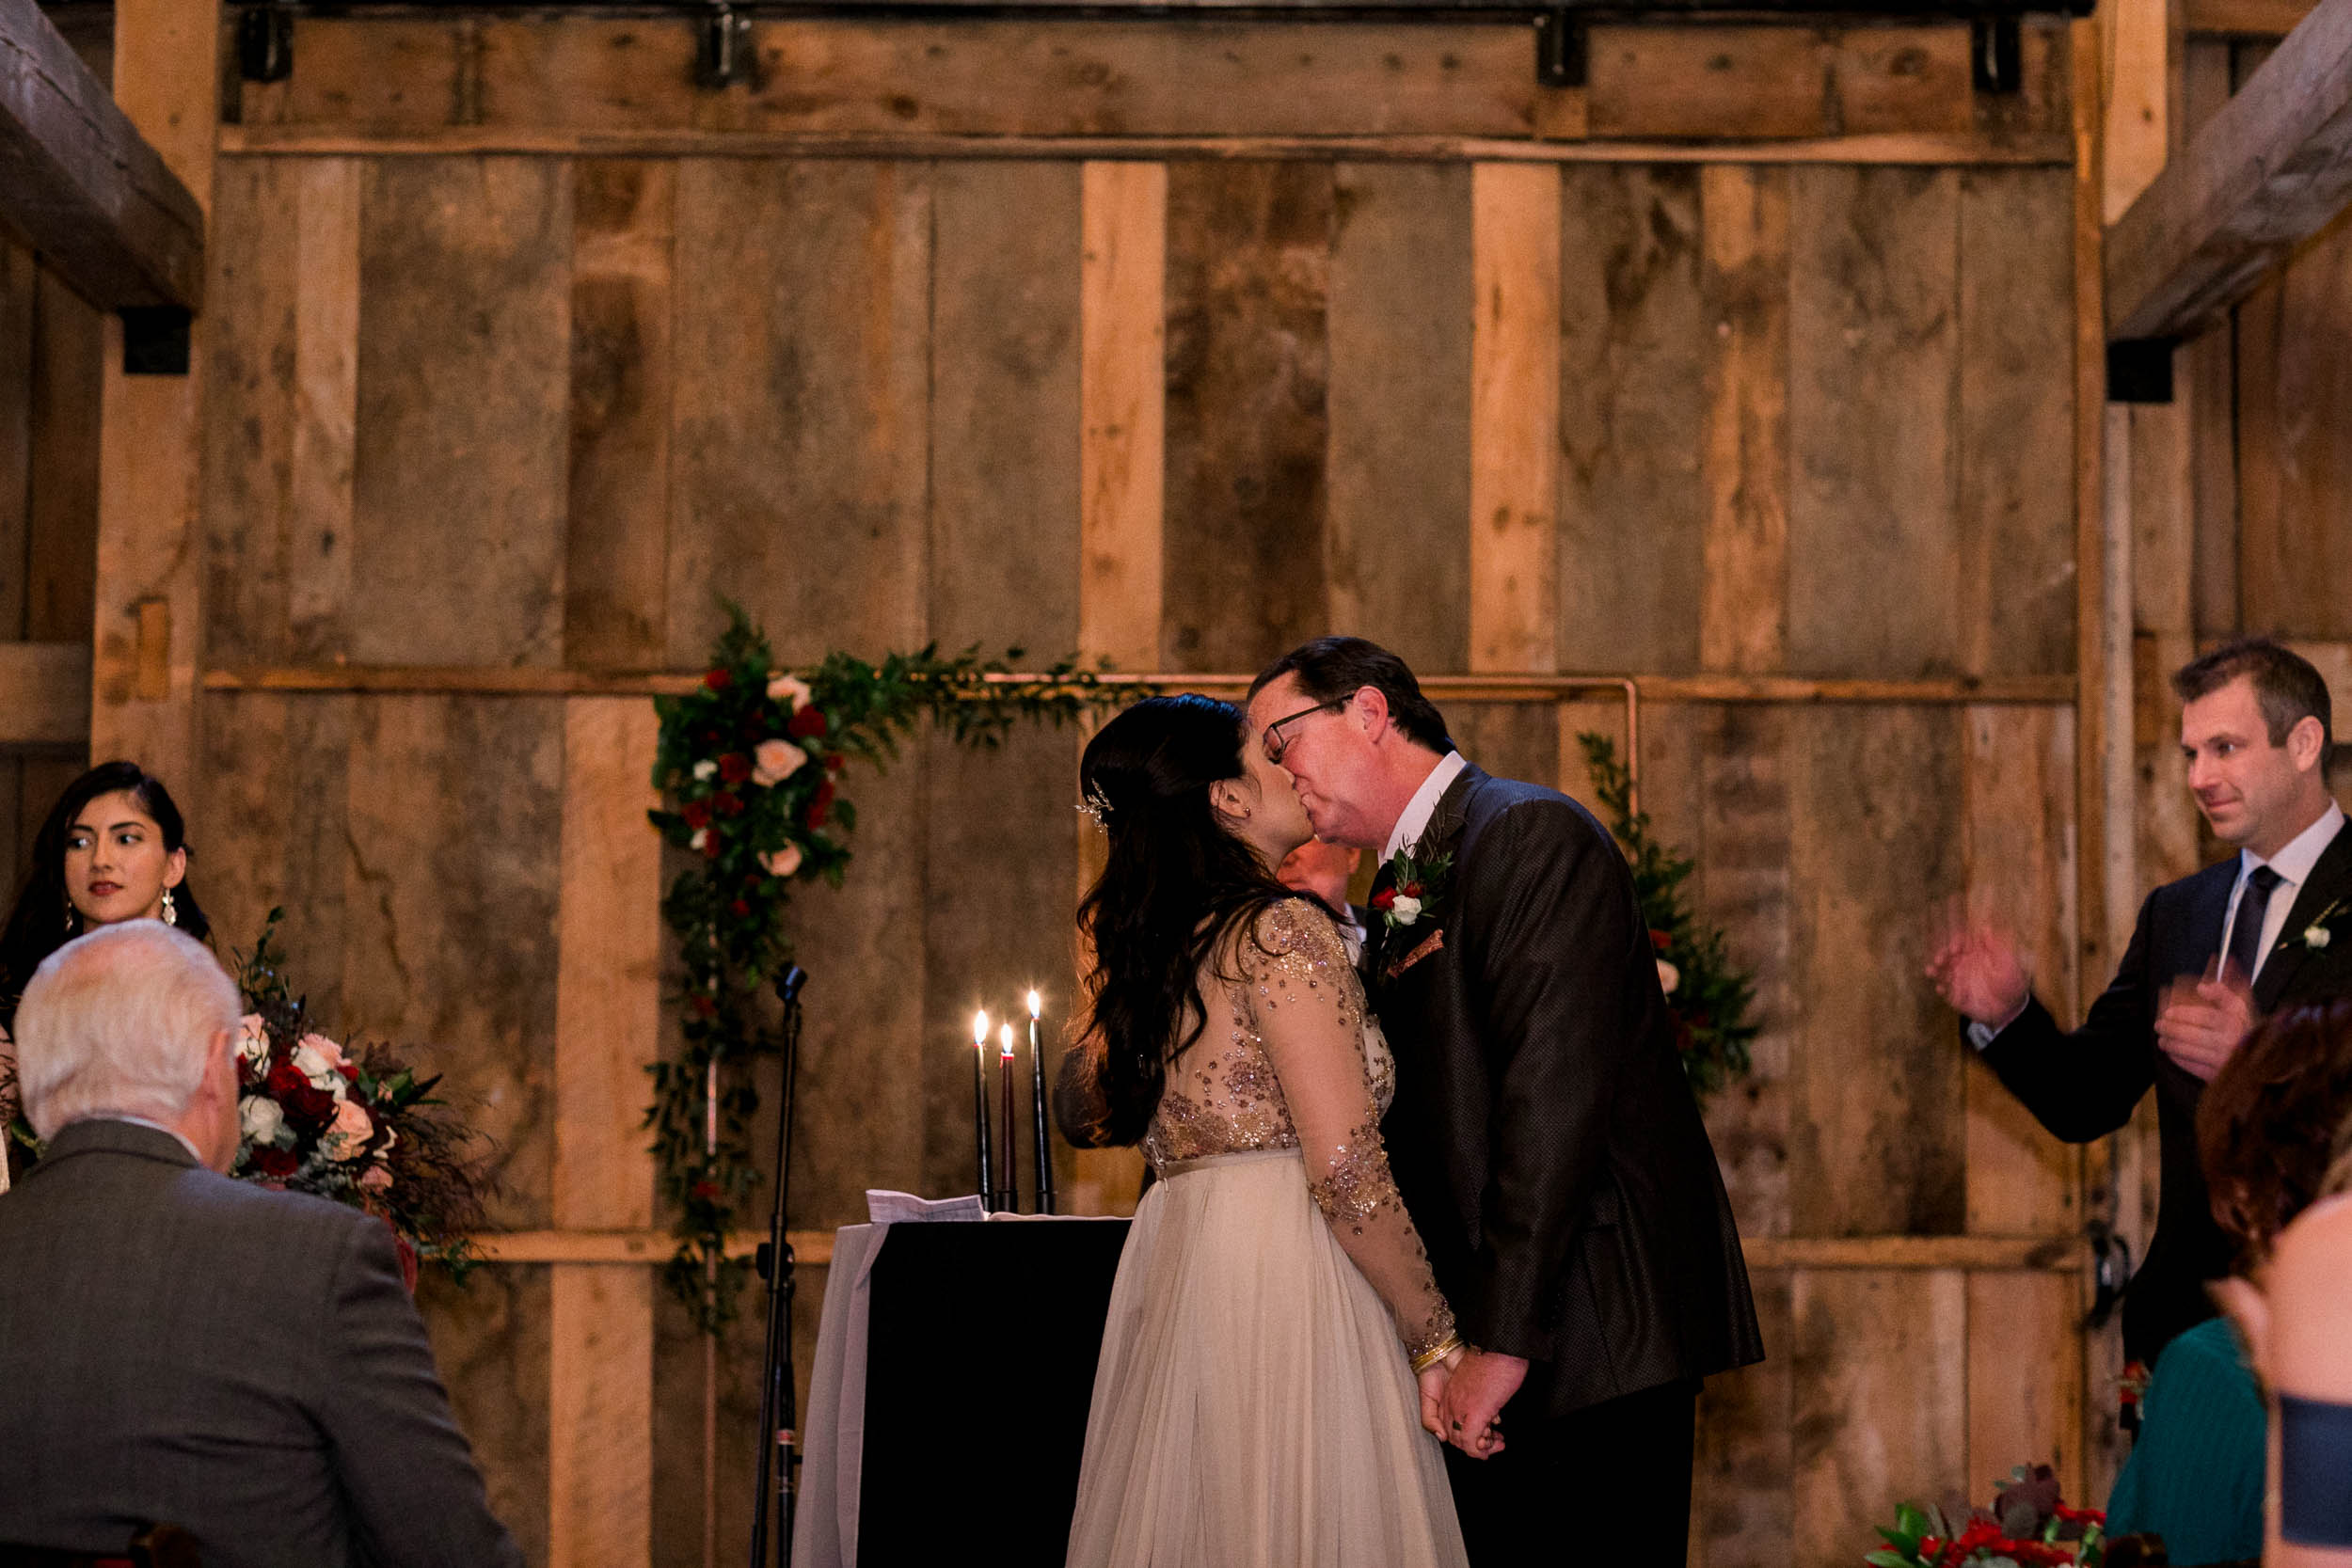 J+J Portland Maine Wedding_Buena Lane Photography_102718_ER_423.jpg